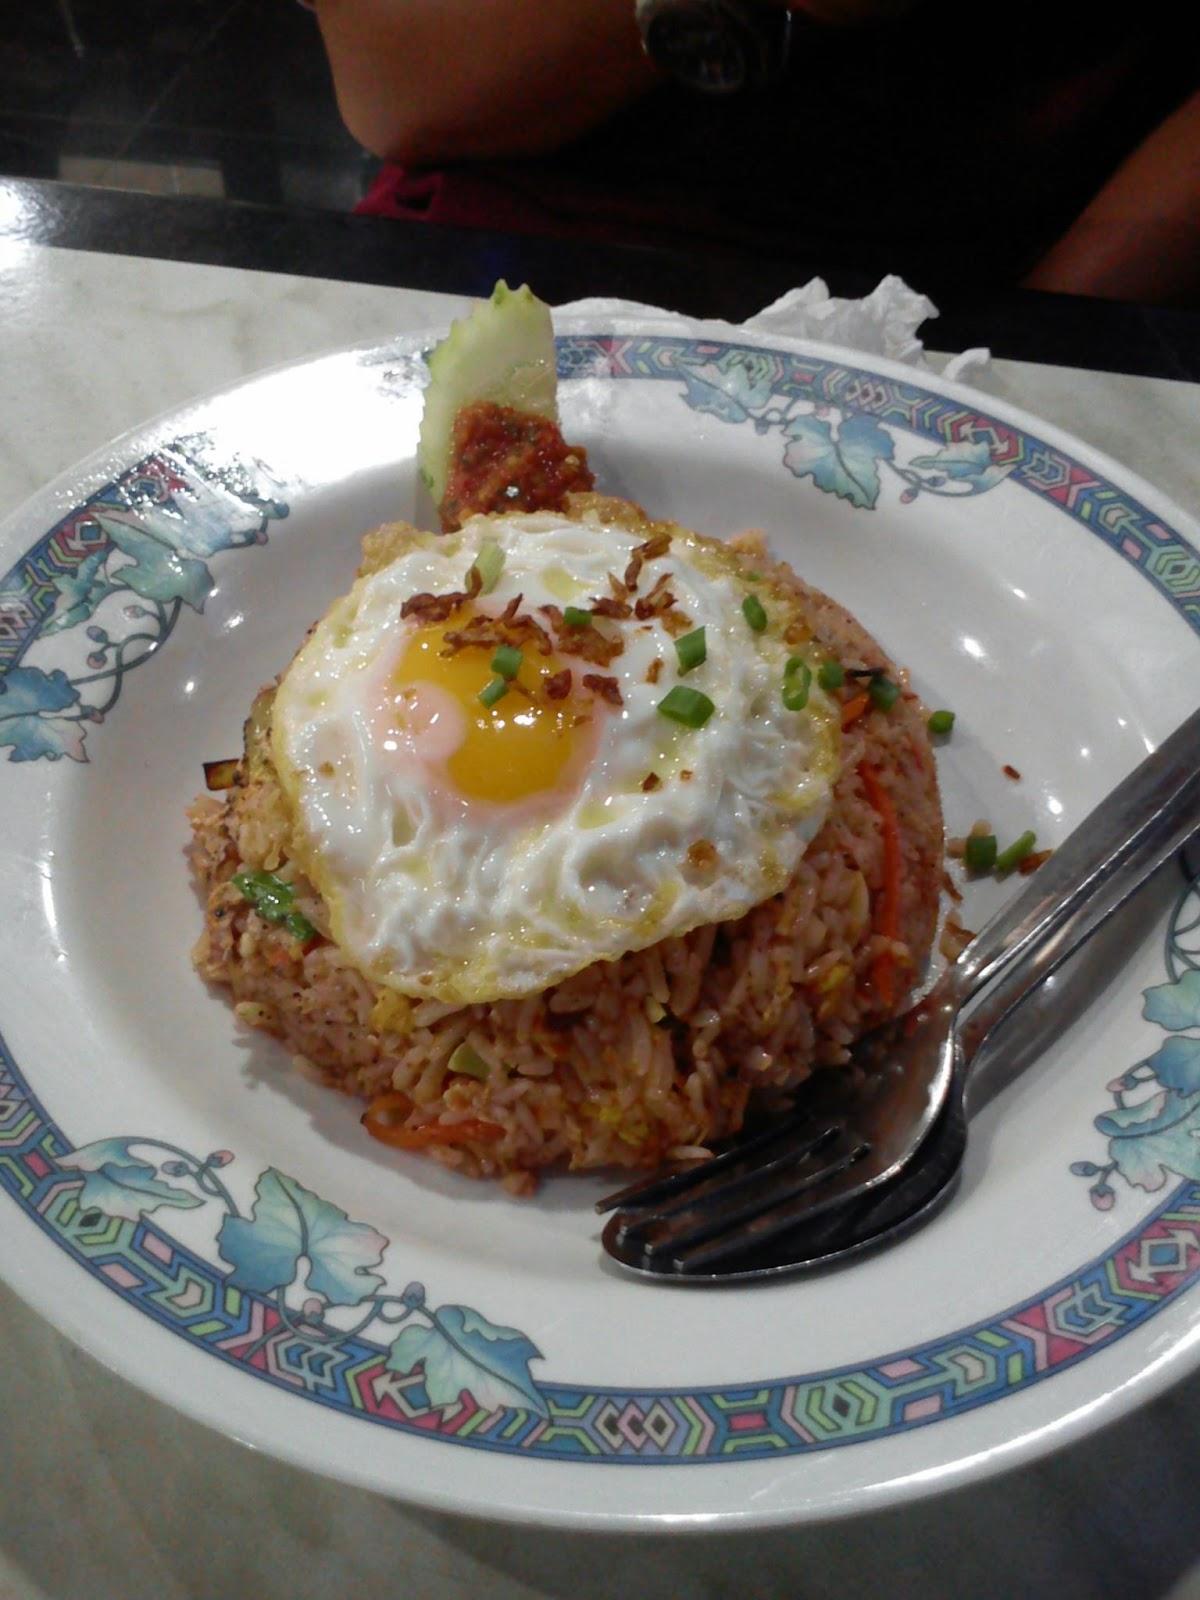 Celoteh Izan: Nasi goreng daging rusa.